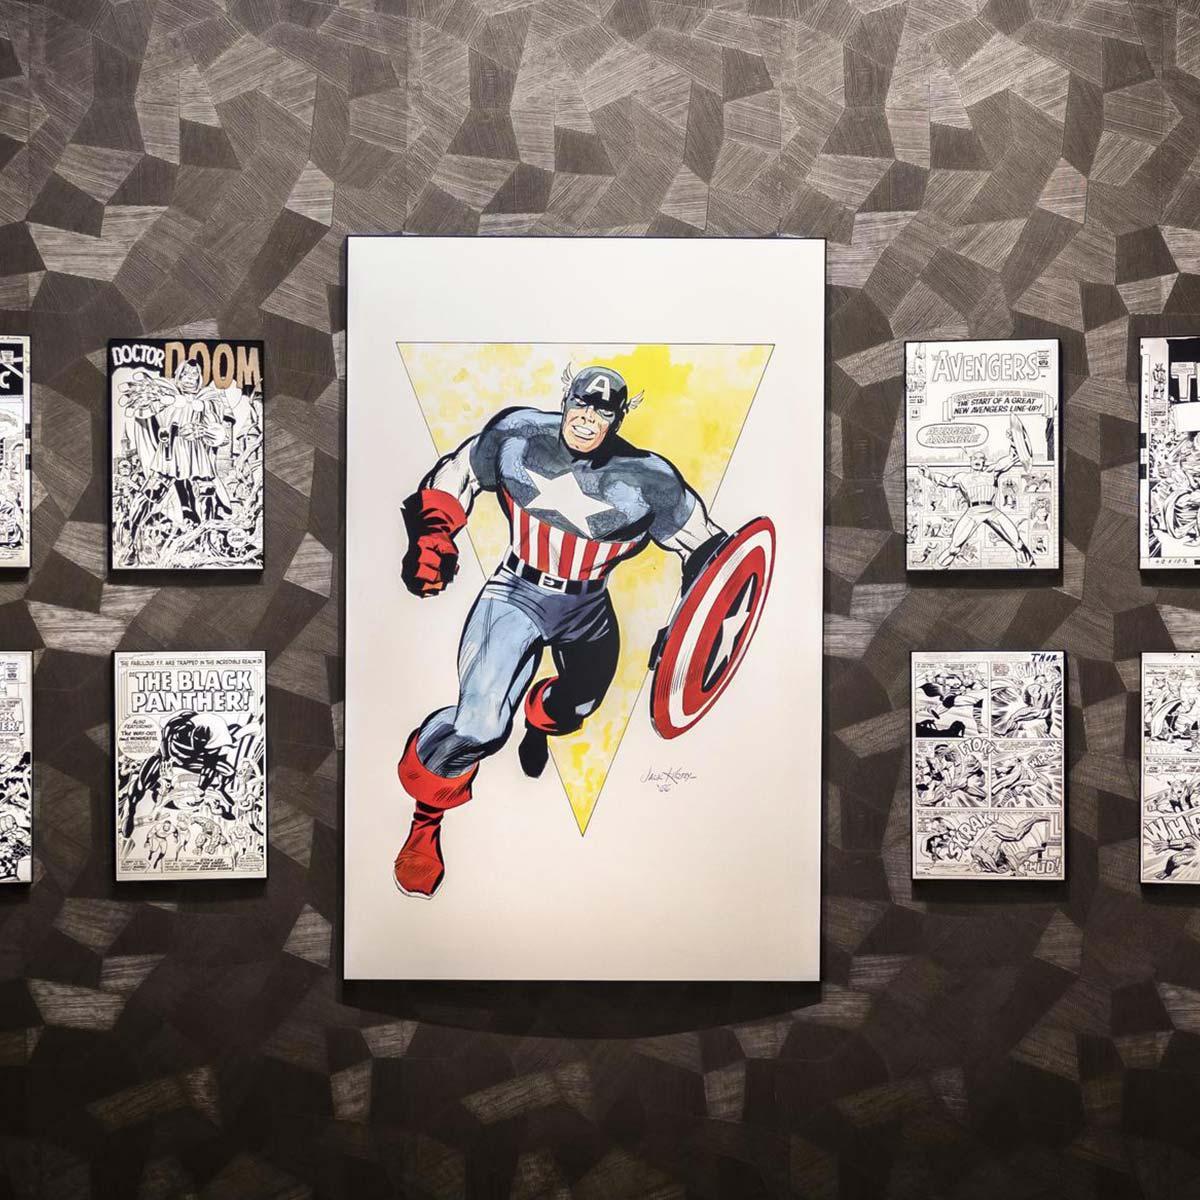 Super hero artwork around every corner